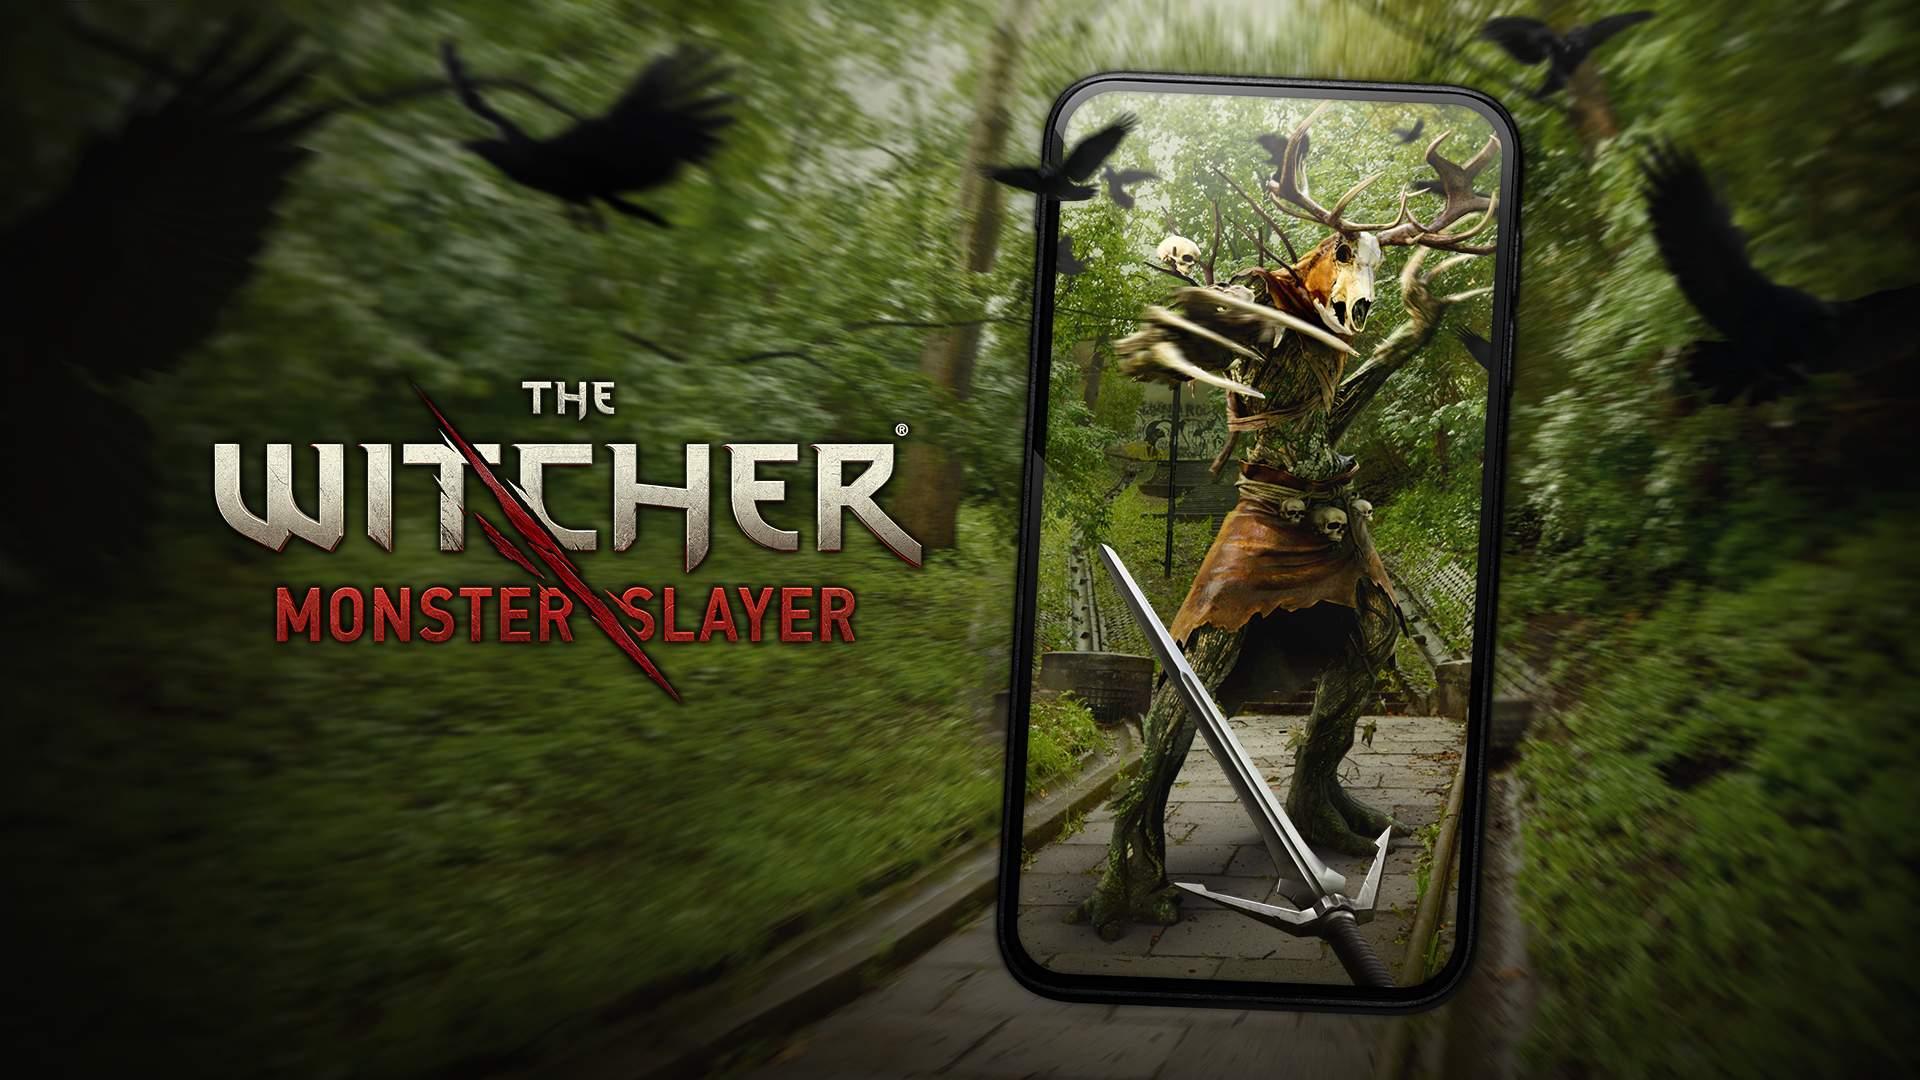 AR-Game The Witcher: Monster Slayer angekündigt